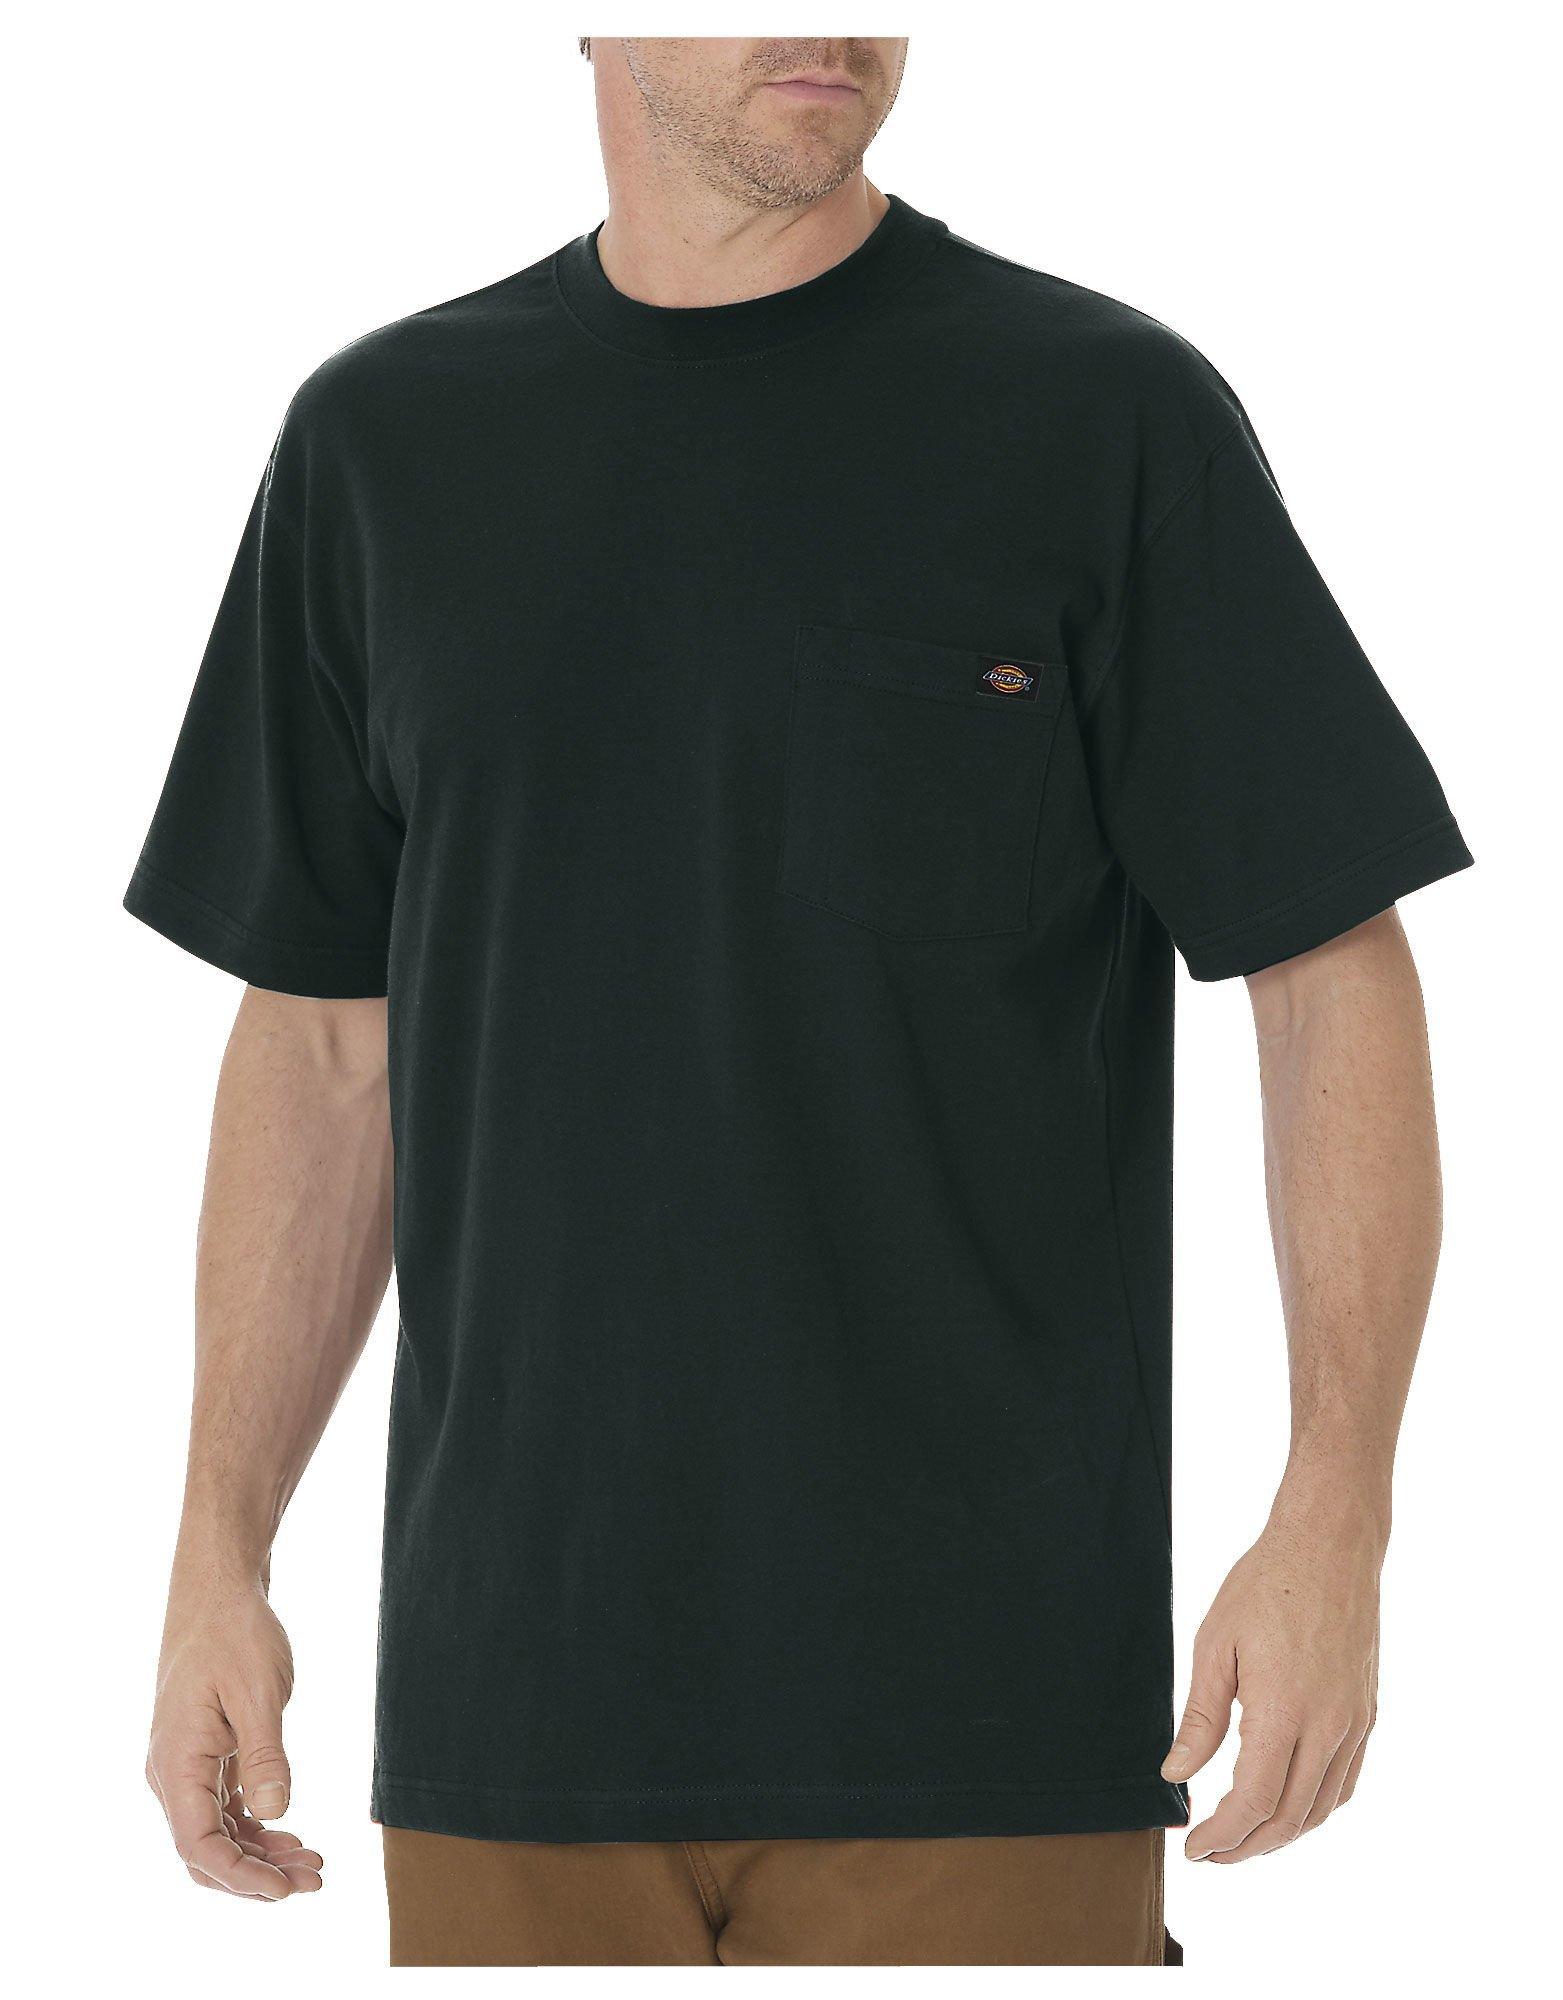 Dickies Men's Heavyweight Crew Neck Shirt, Hunter Green, S